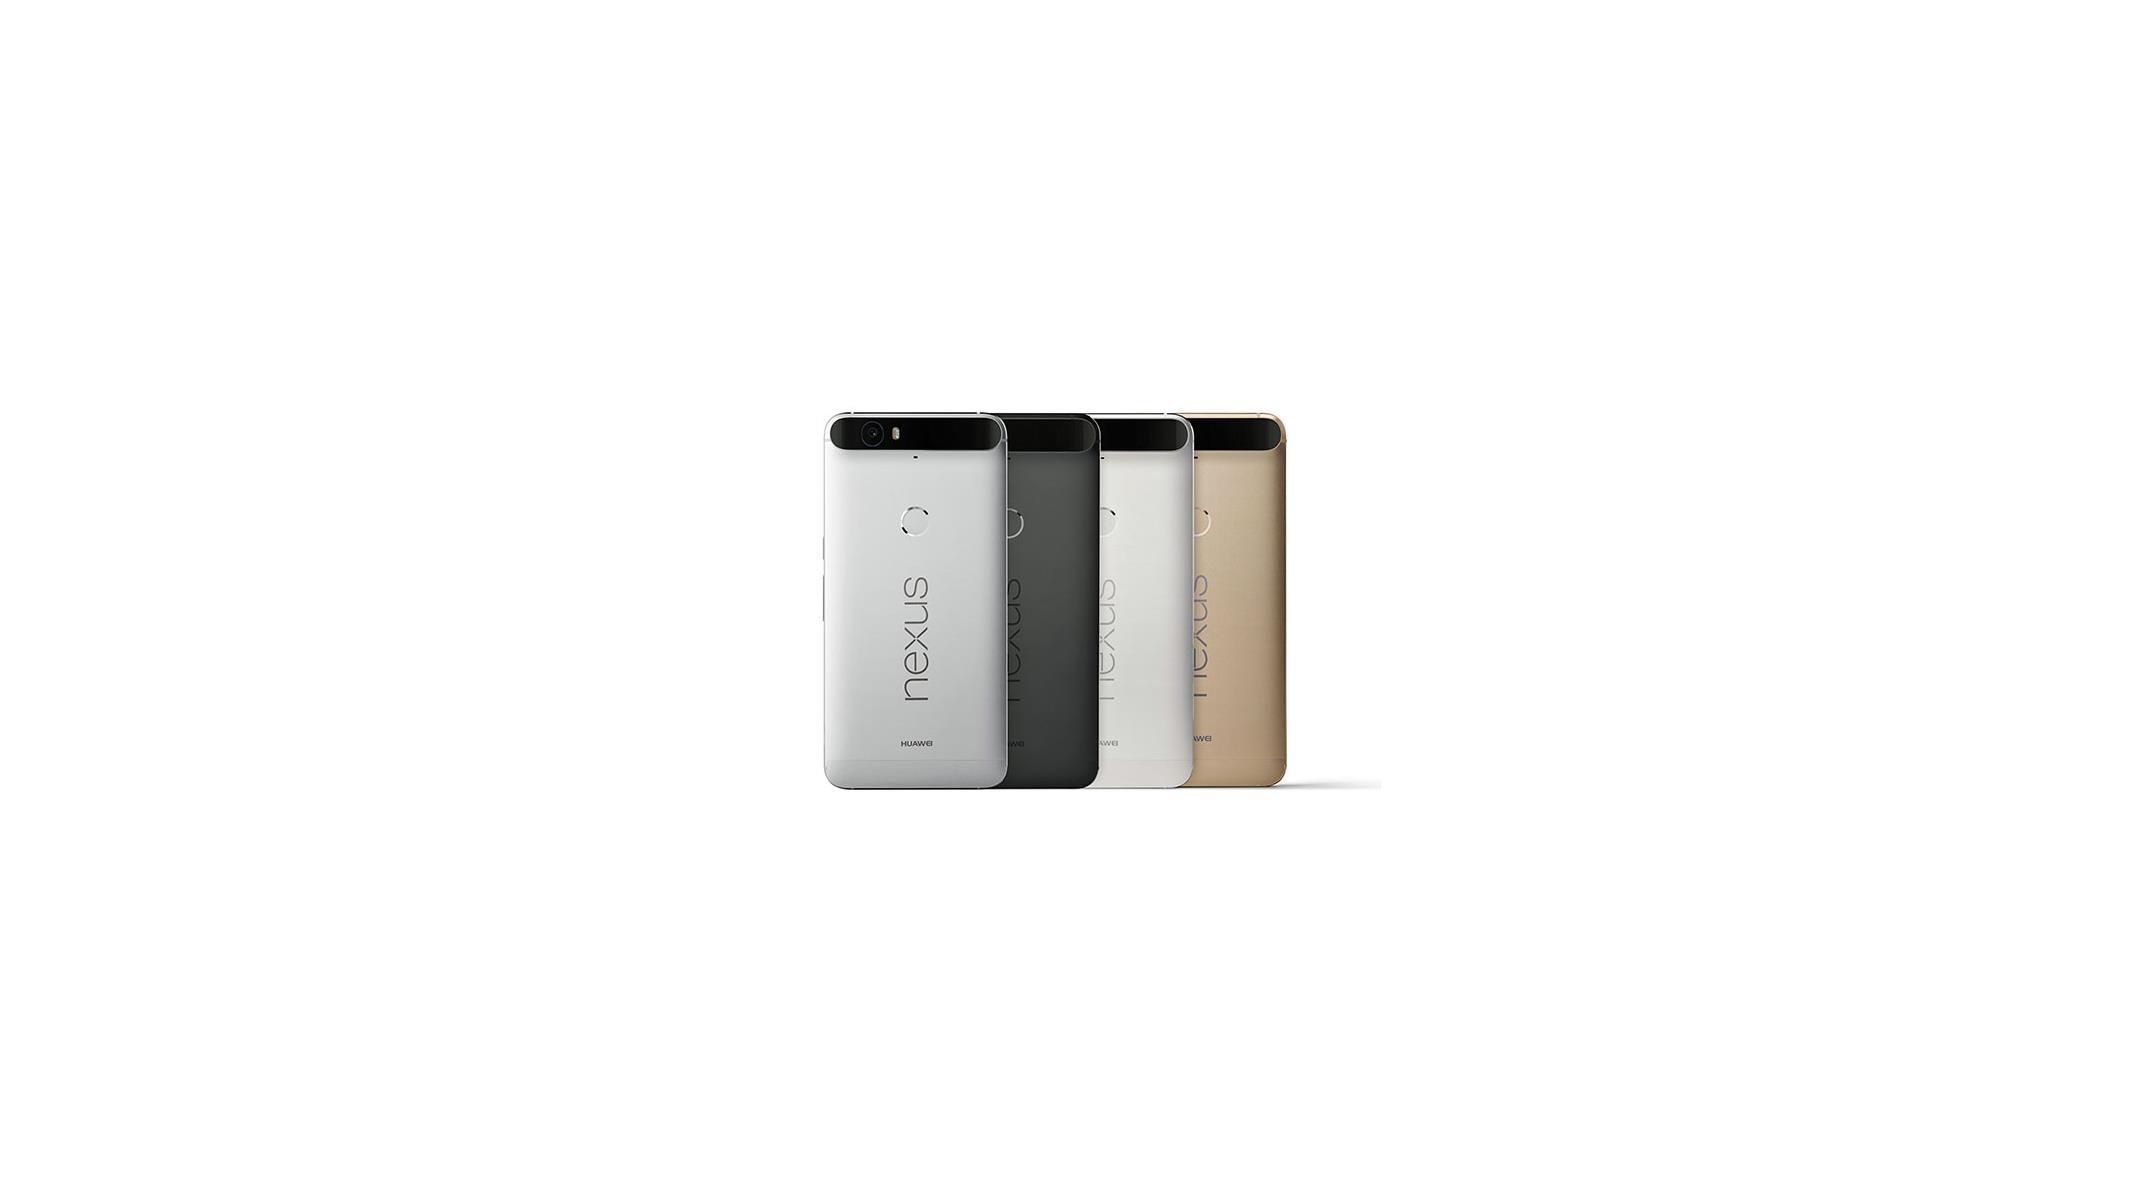 Google Sends Final Software Update To Legacy Nexus 5X And Nexus 6P